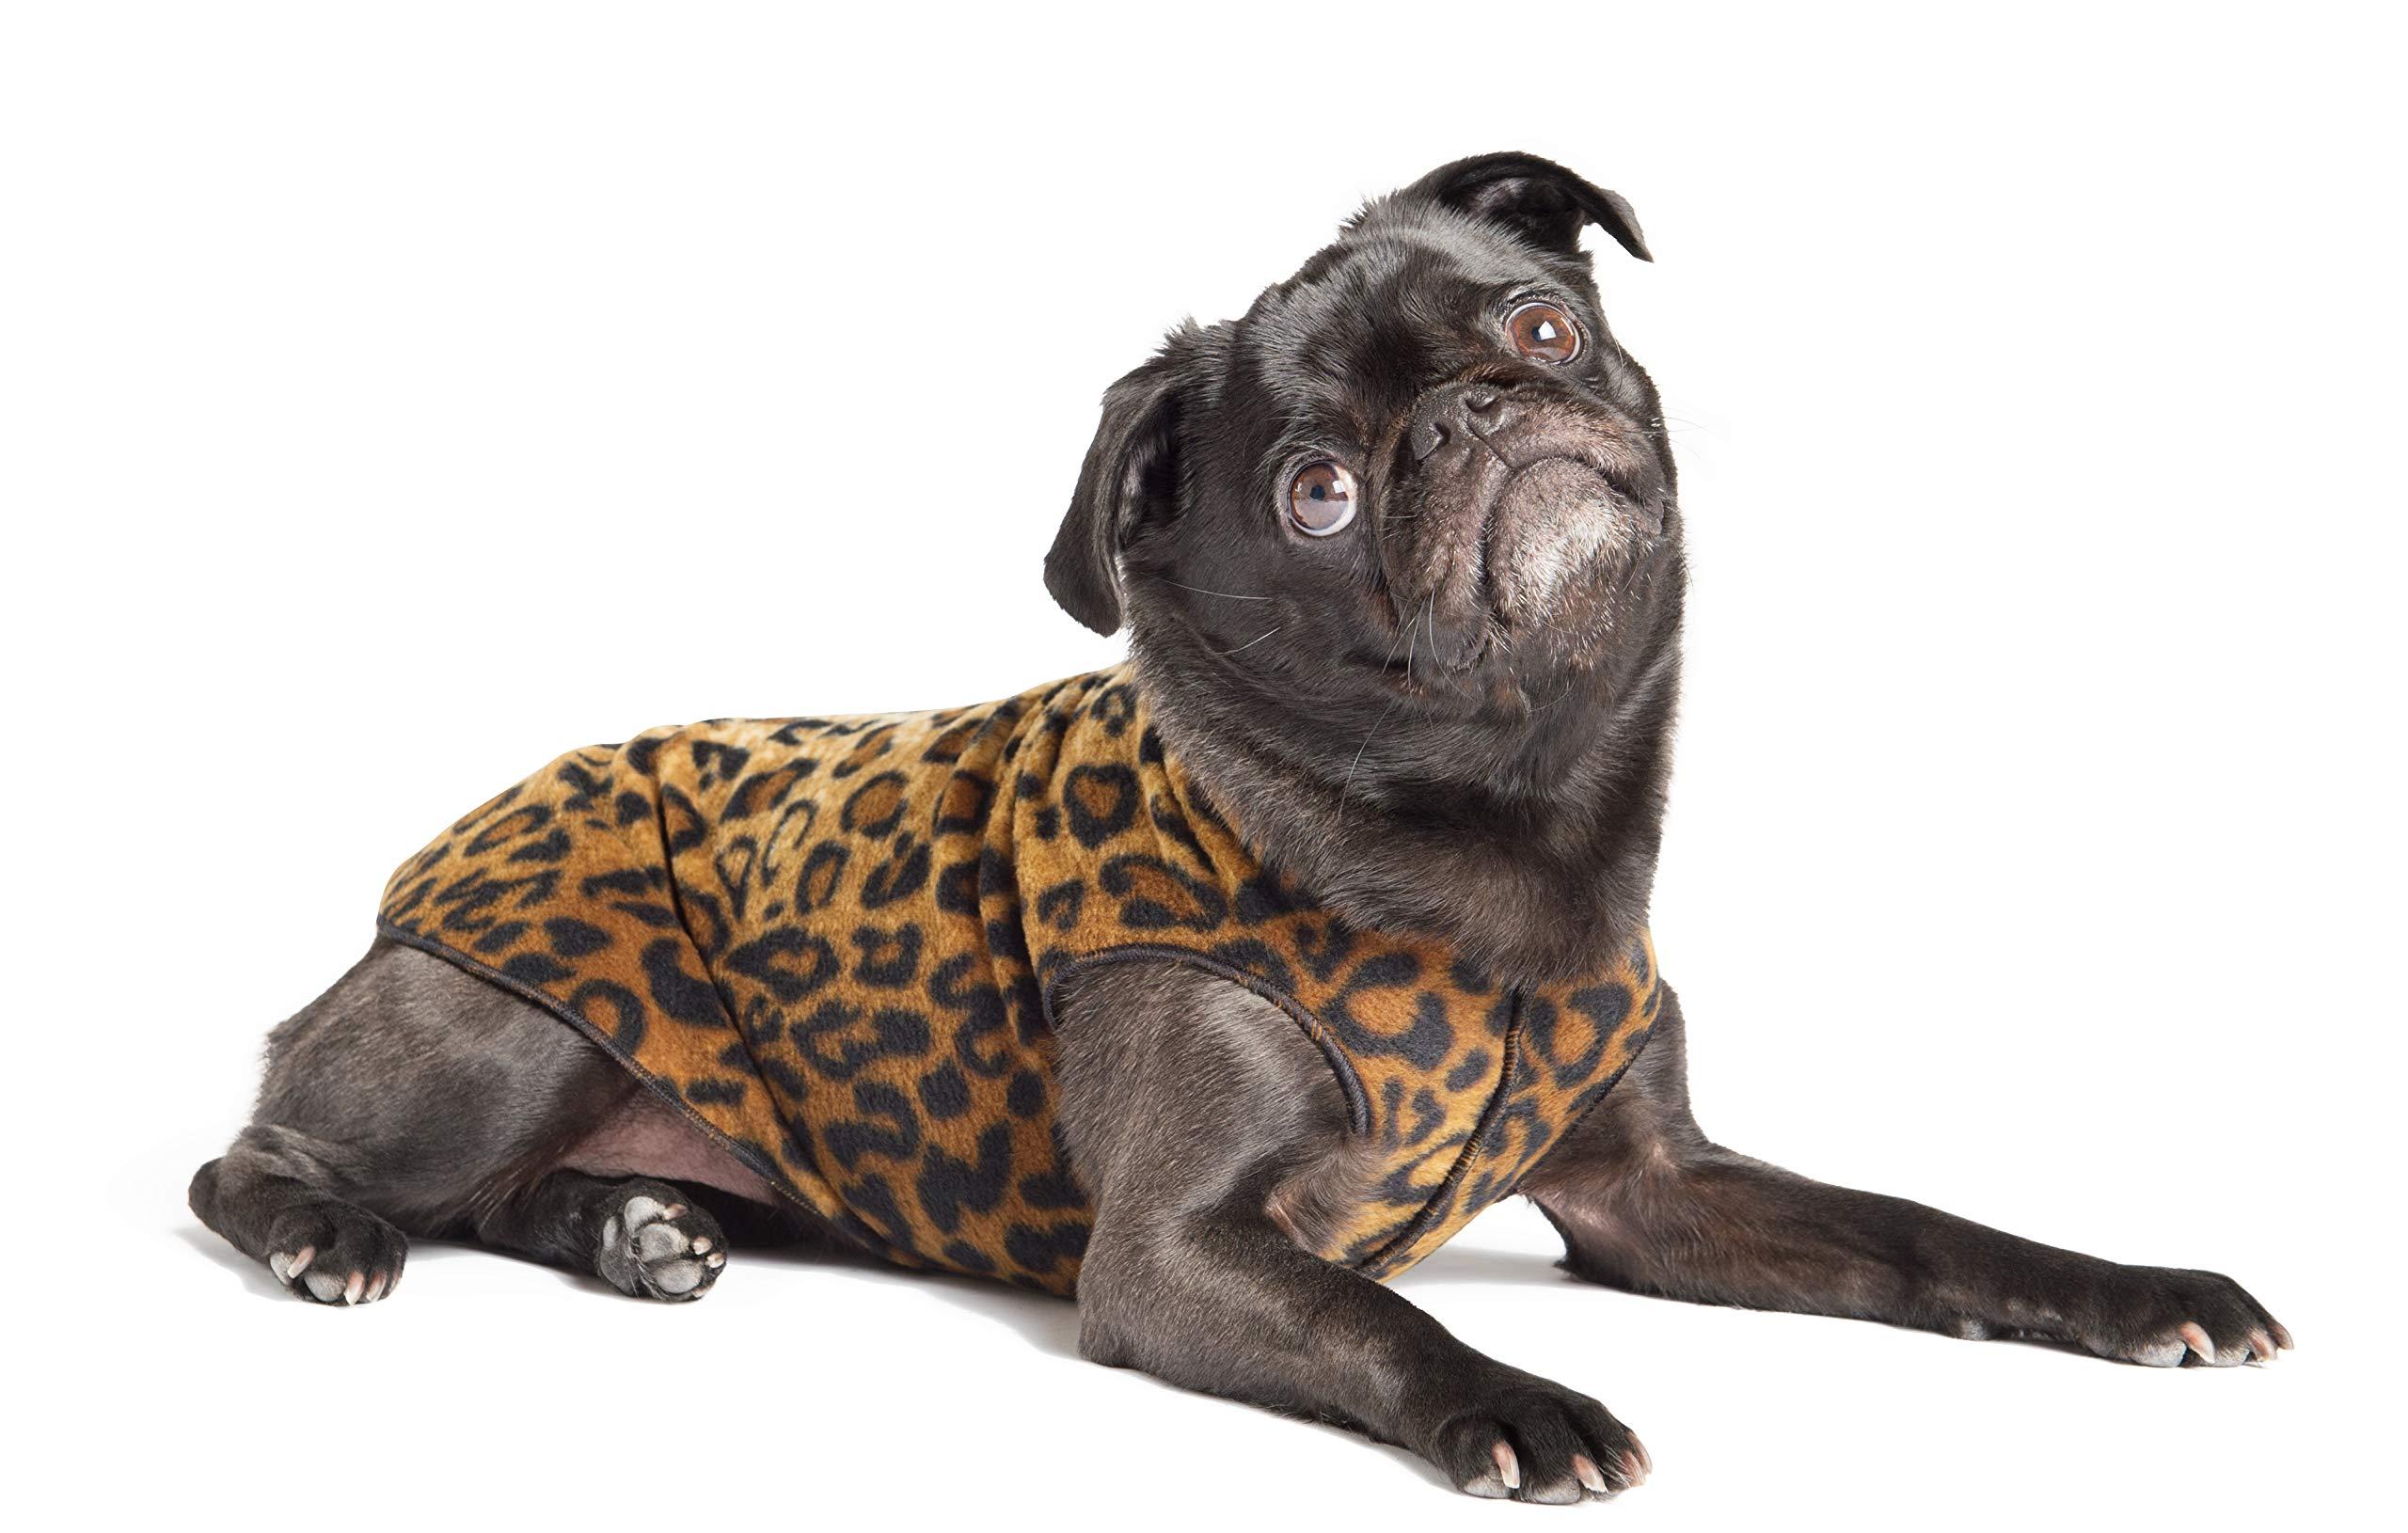 Gold Paw Stretch Fleece Dog Coat - Soft, Warm Dog Clothes, Stretchy Pet Sweater - Machine Washable, Eco Friendly - All Season - Sizes 2-33, Leopard, Size 8 by Gold Paw